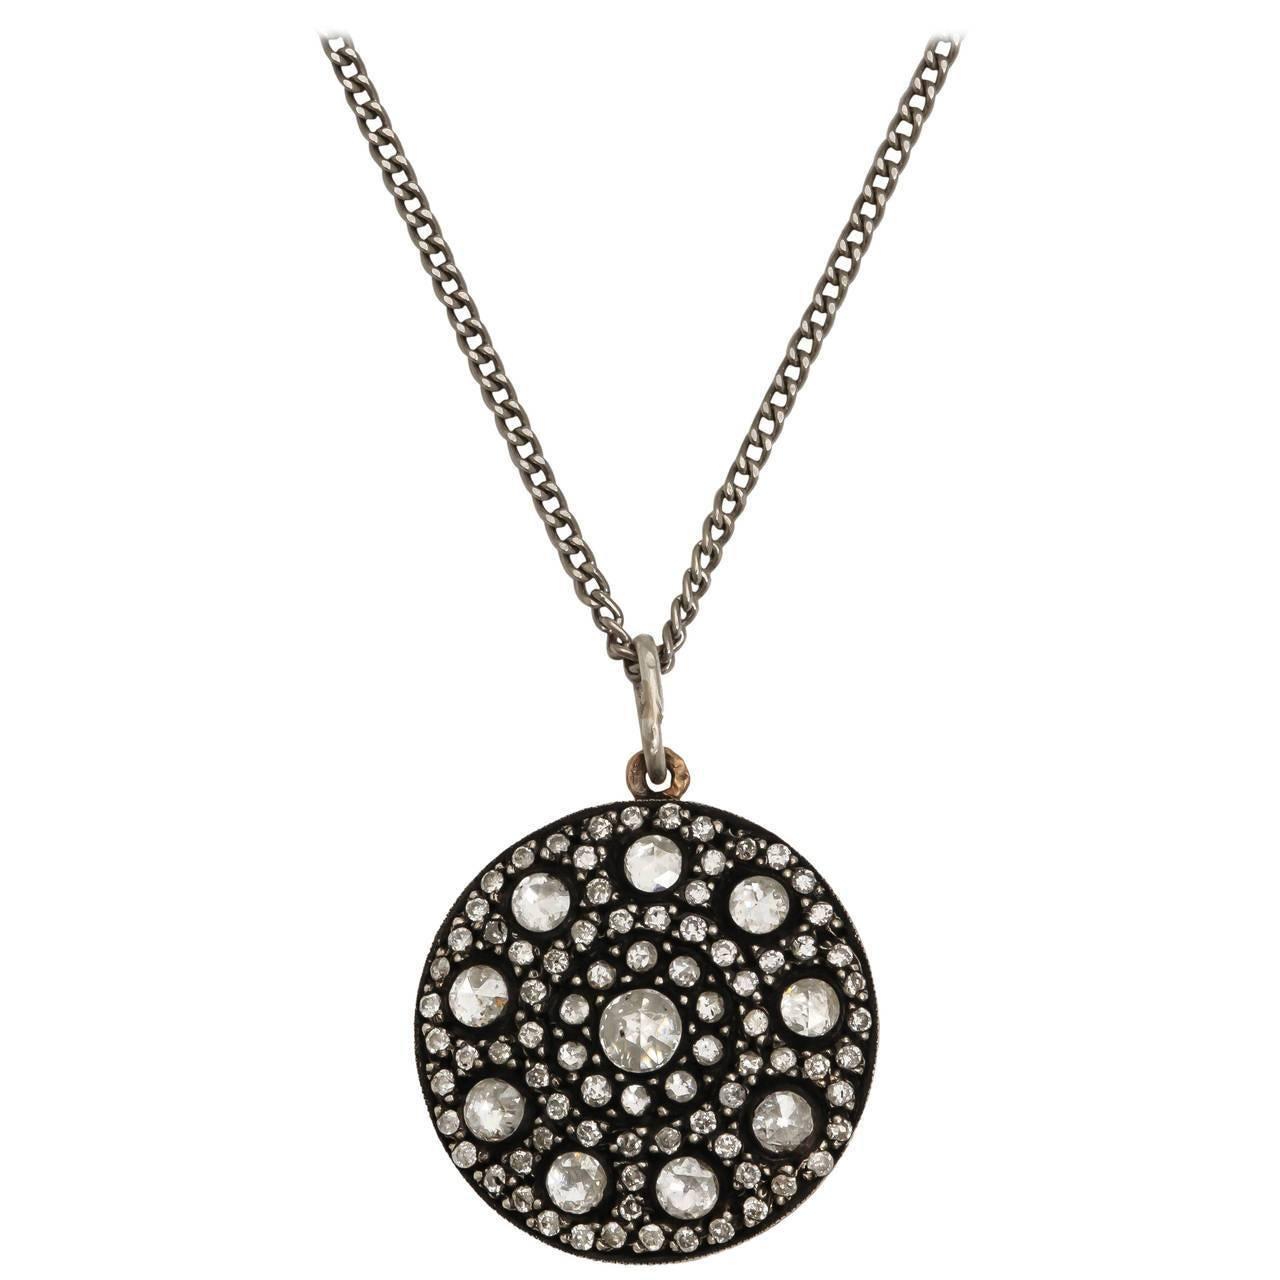 Russian Revival Necklaces